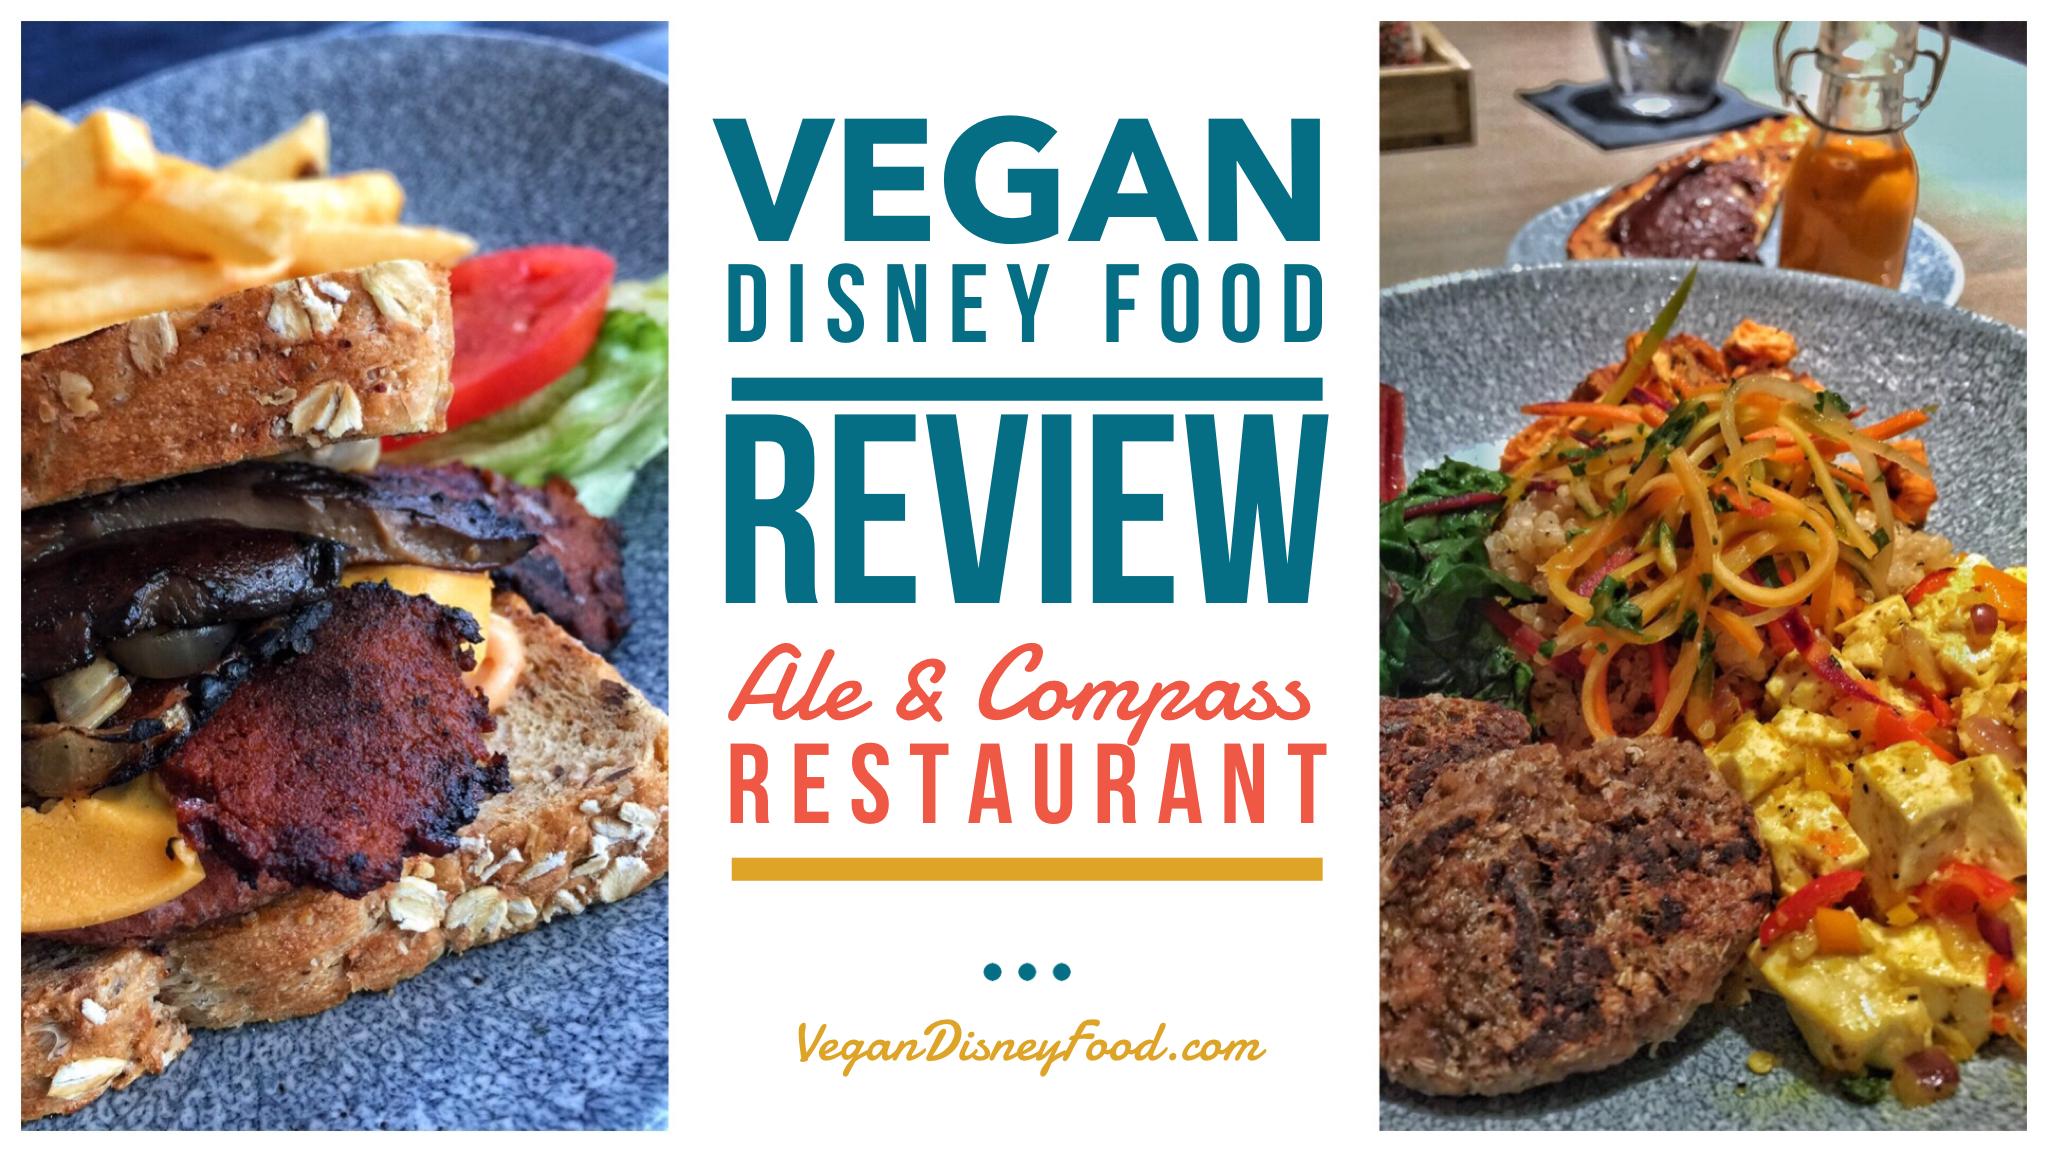 Vegan Disney Food Review: Ale & Compass Restaurant at Disney's Yacht Club Resort